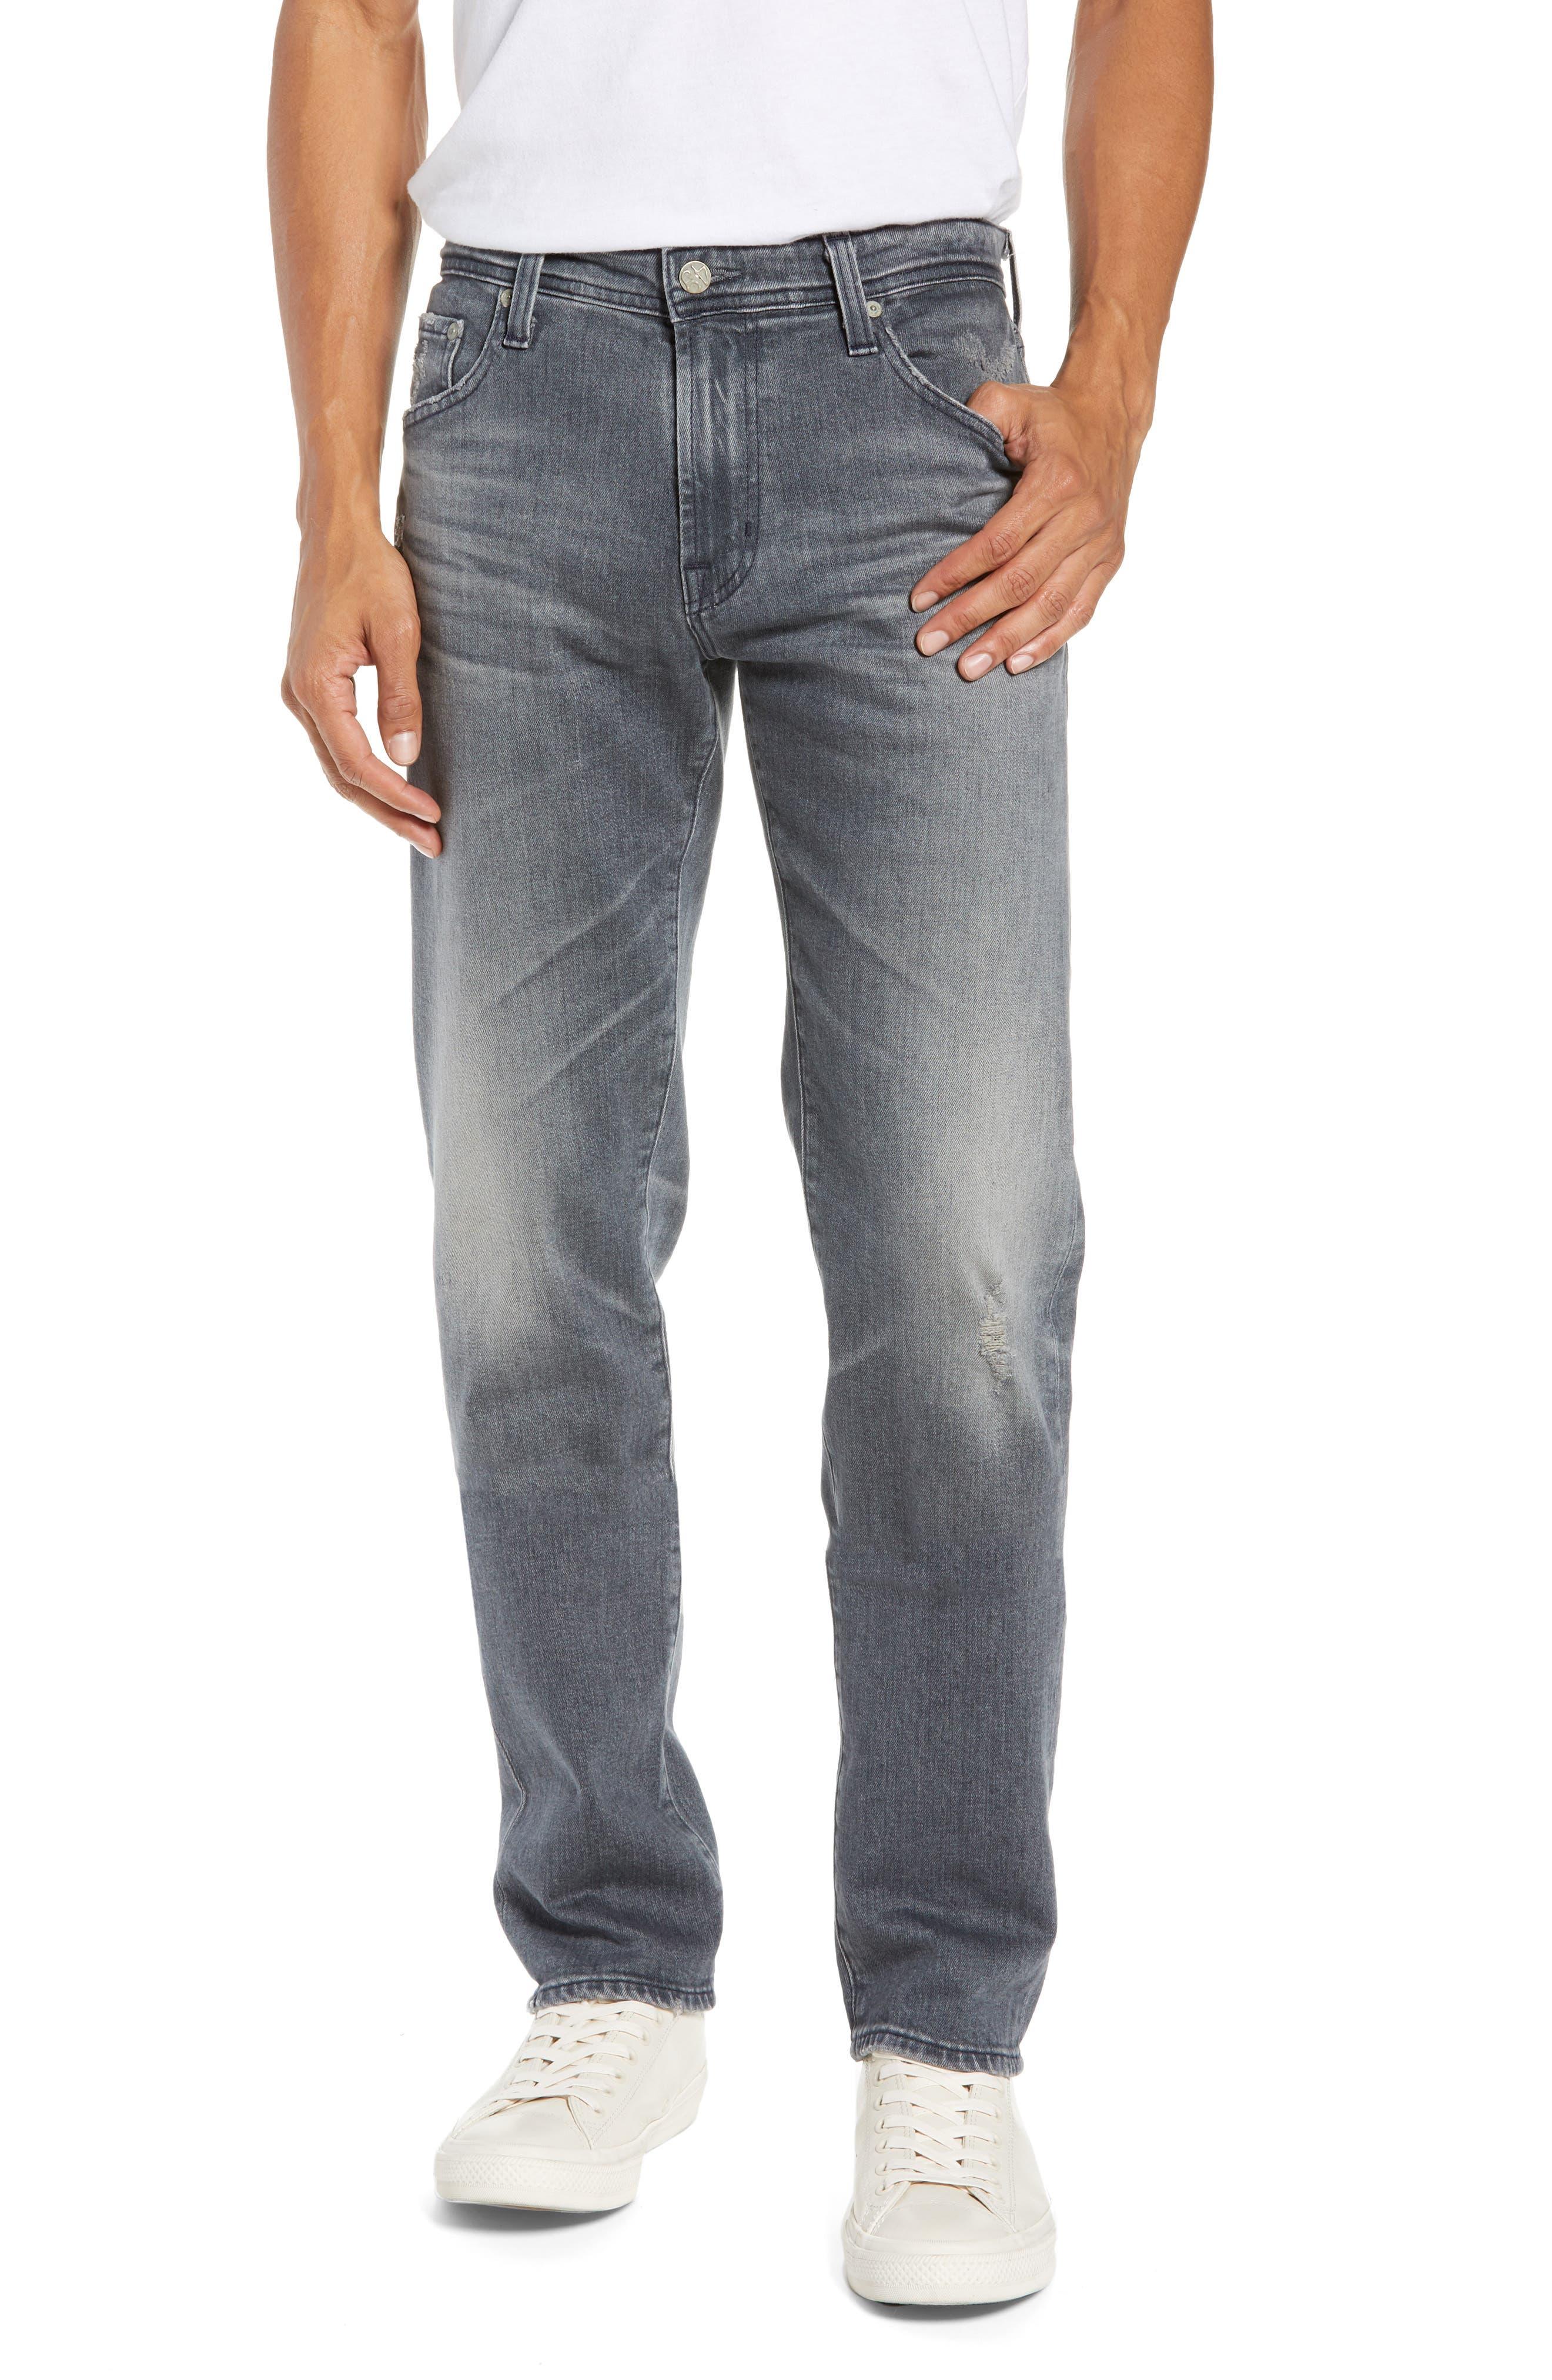 Tellis Slim Fit Jeans,                         Main,                         color, 8 YEARS CONJURE